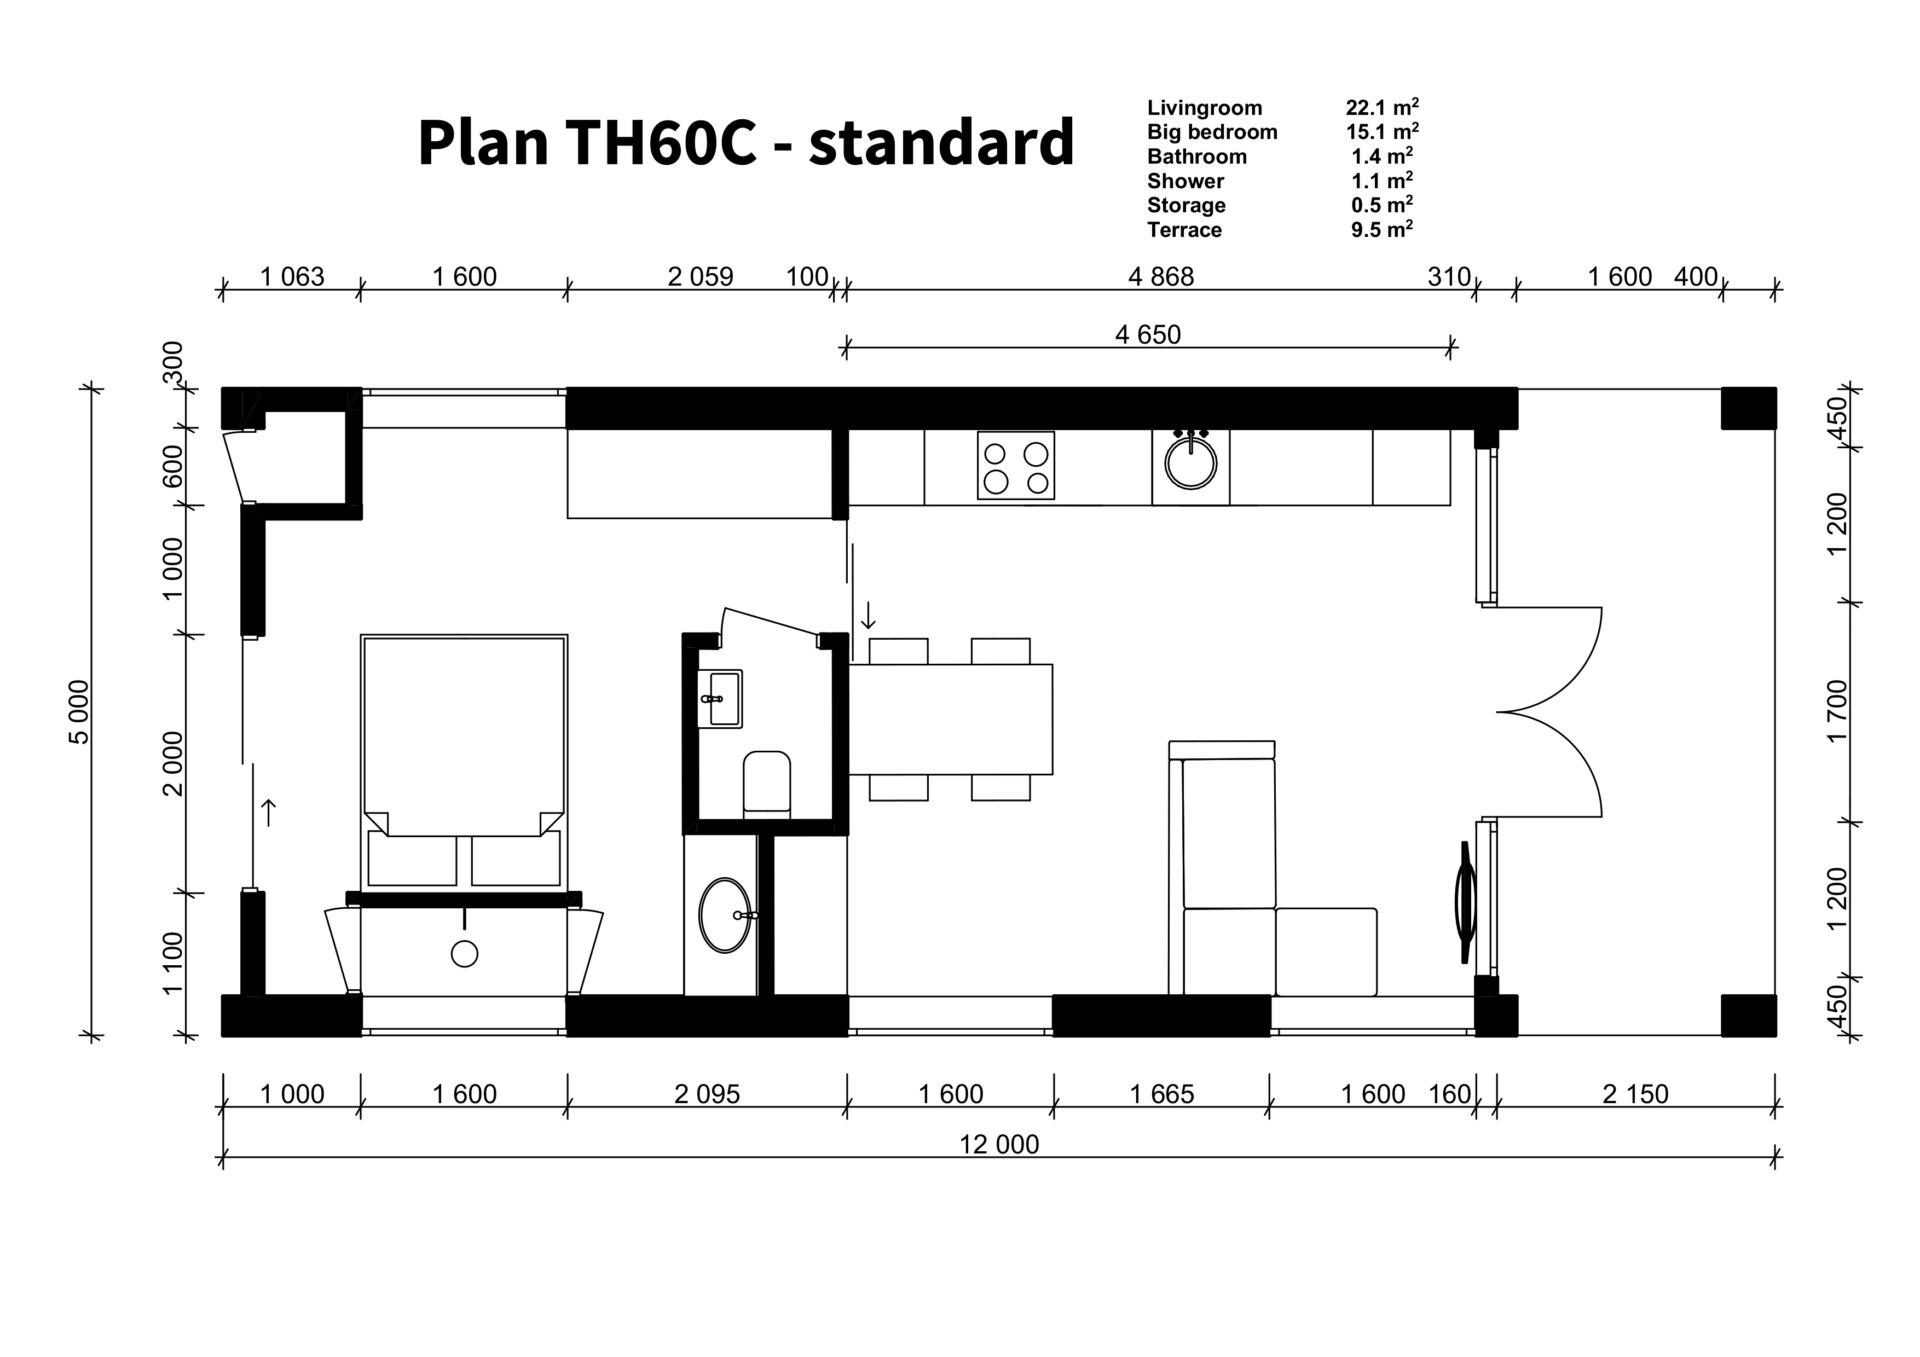 TH60C - standard plan